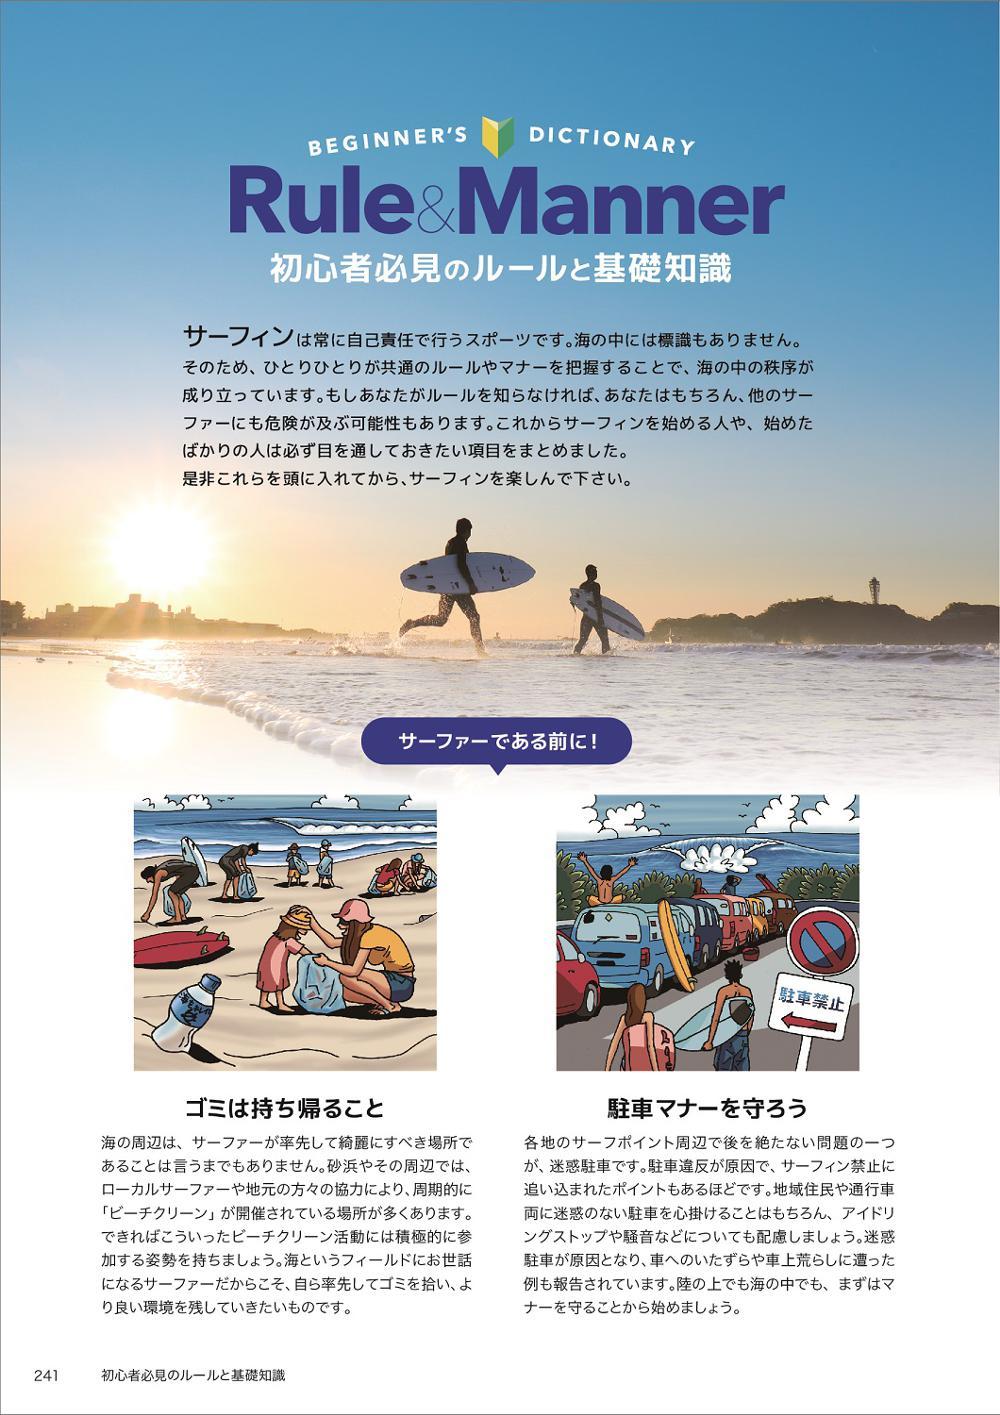 5.rule_manner